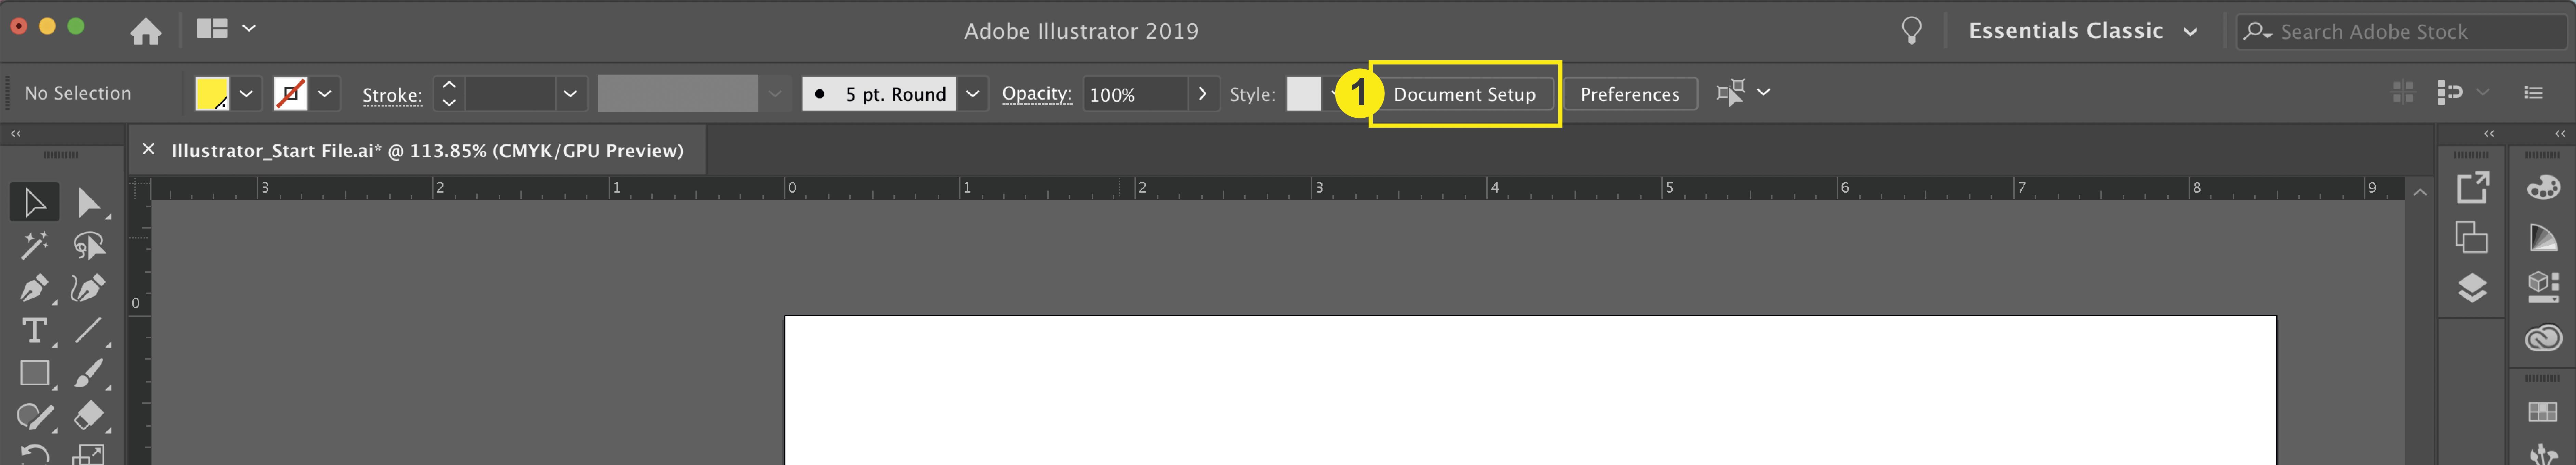 Illustrator_Document Setup